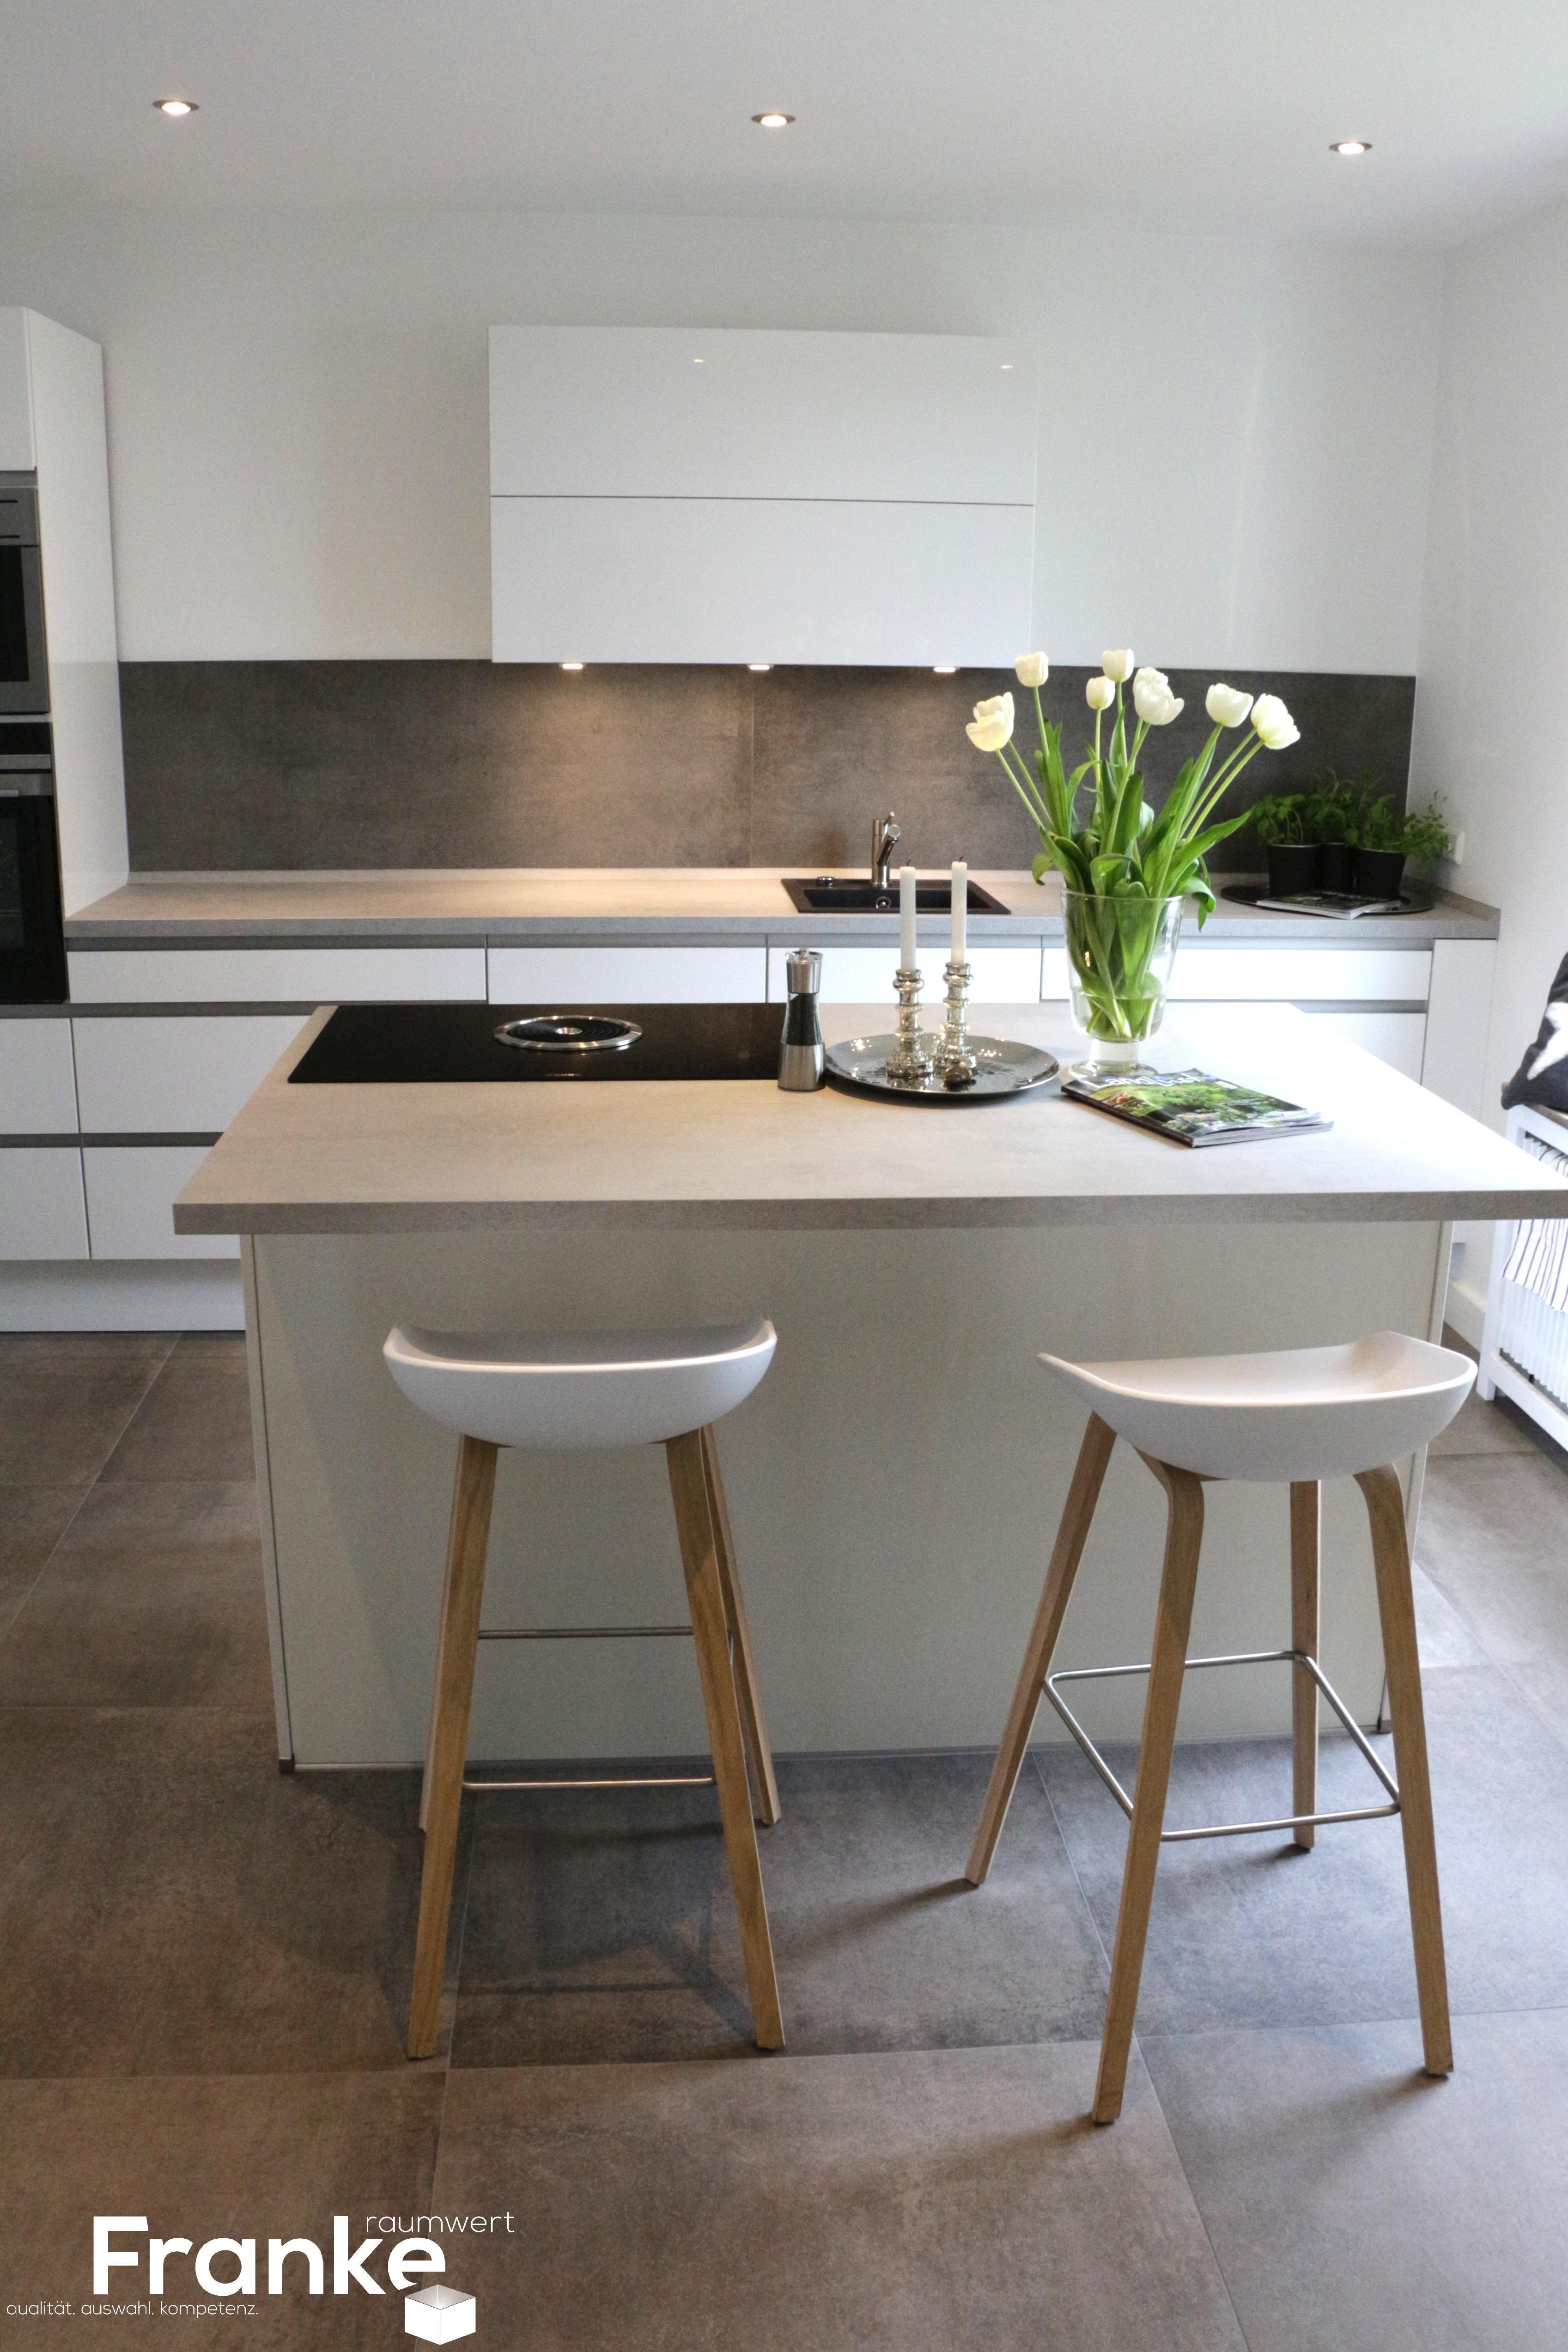 35 Barhocker Küche Ideas Bar Stools Stool Counter Stools